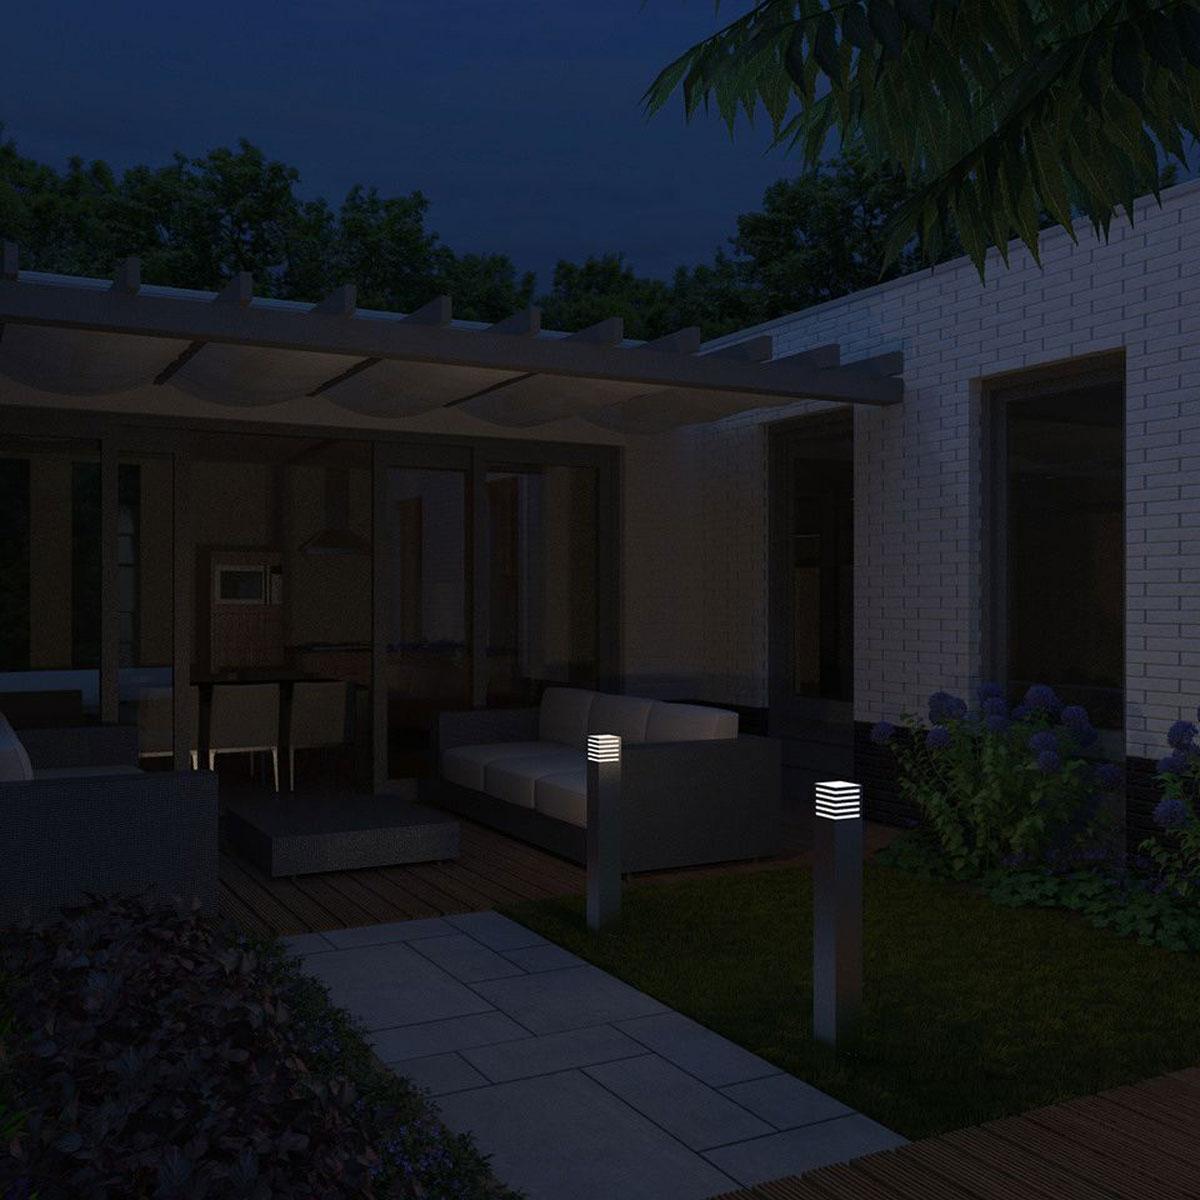 philips mygarden veranda sokkel rvs 80cm. Black Bedroom Furniture Sets. Home Design Ideas